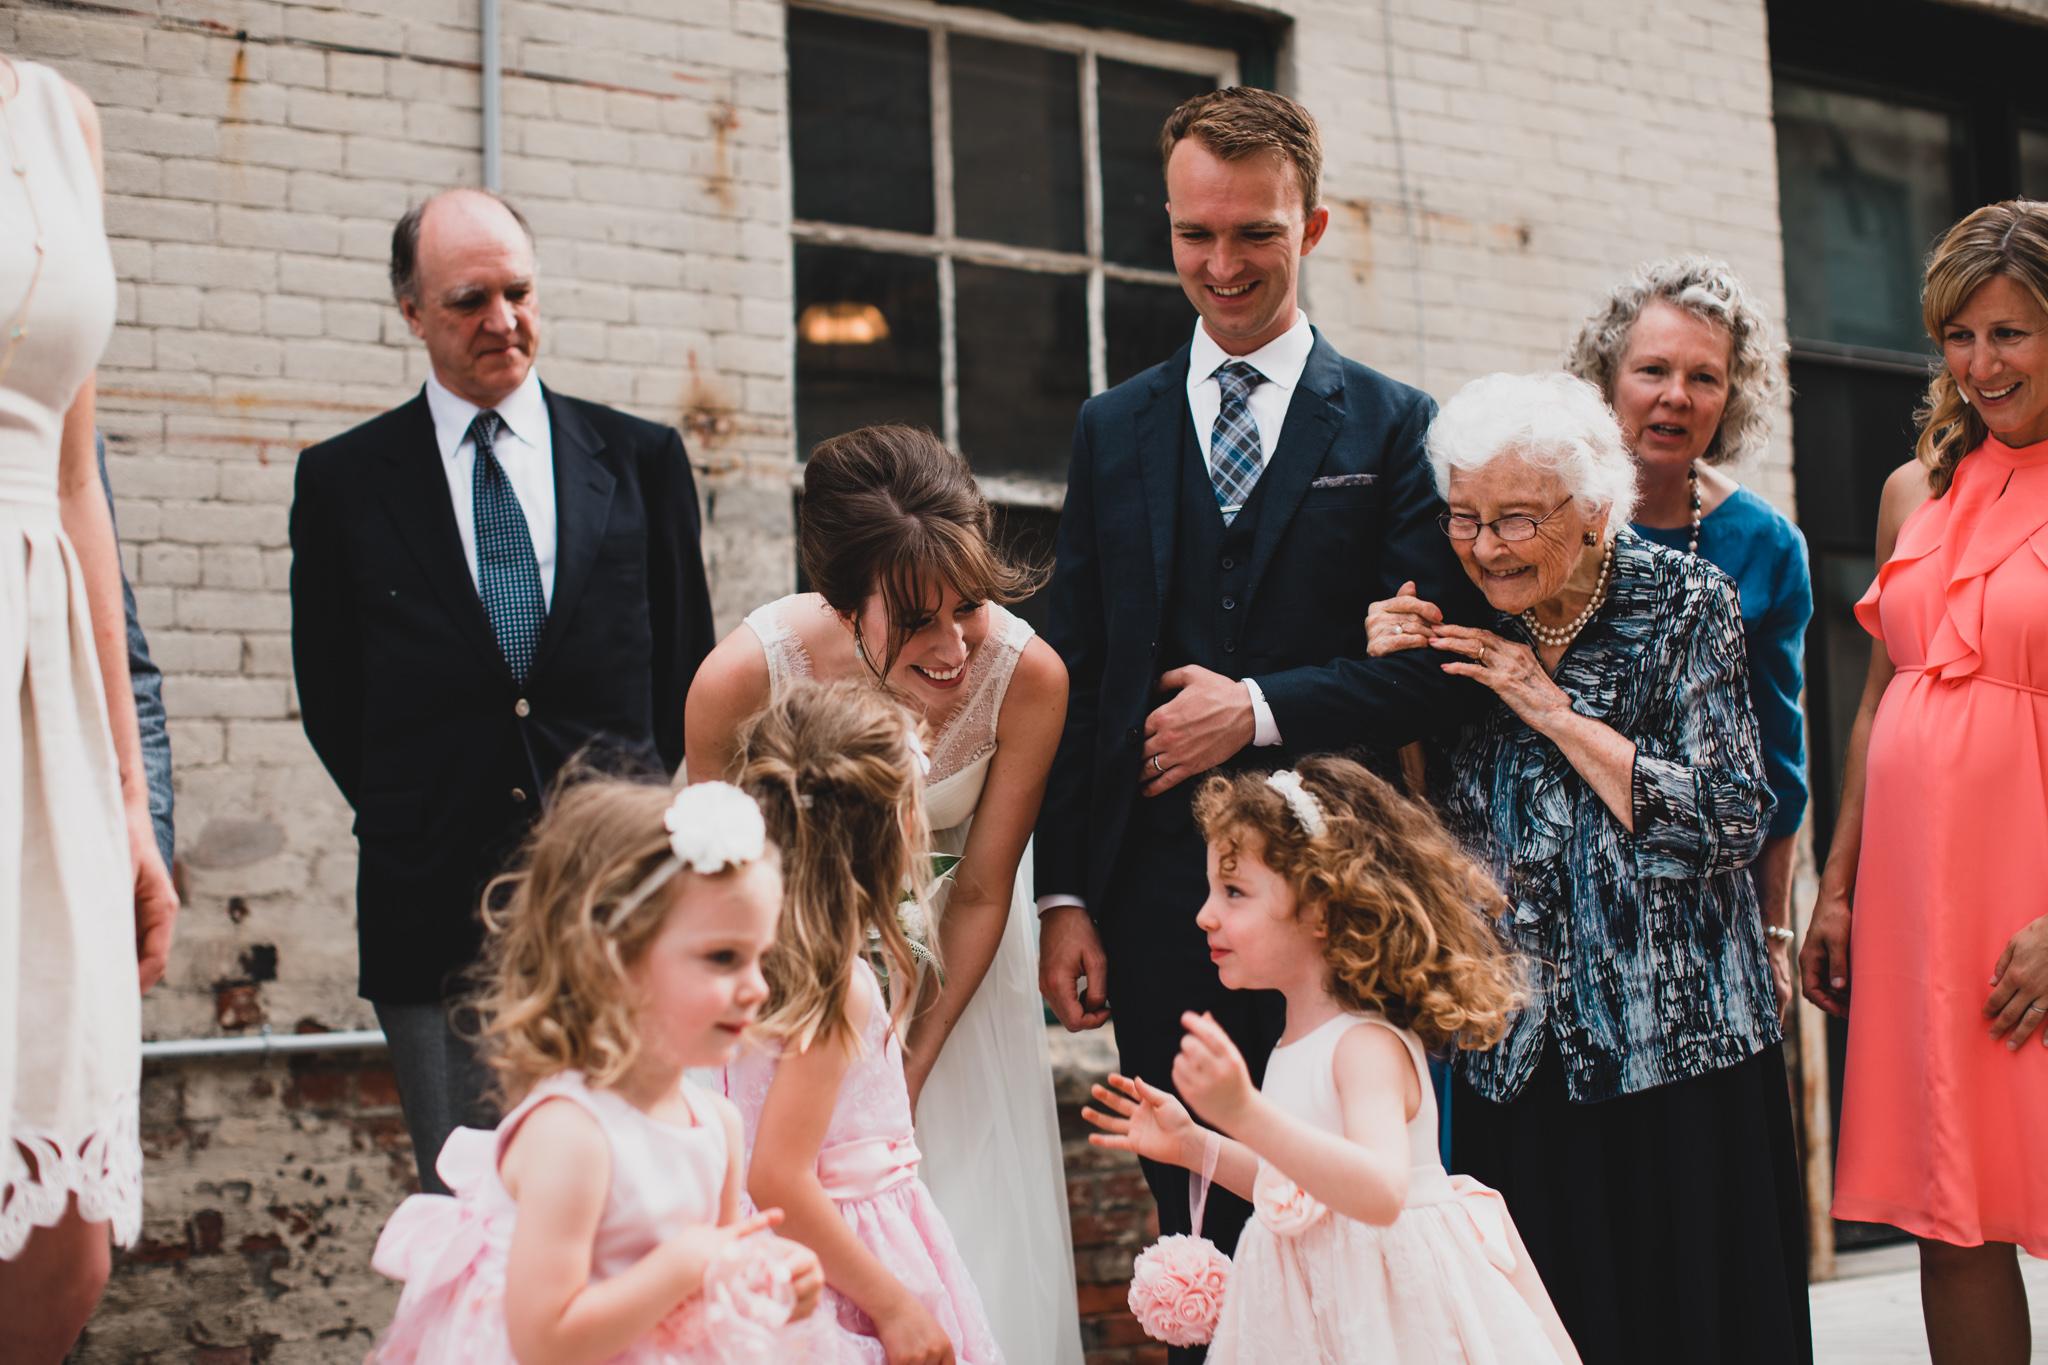 371-WEB-Jonathan-Kuhn-Photography-ClareConor-Wedding-7156.jpg